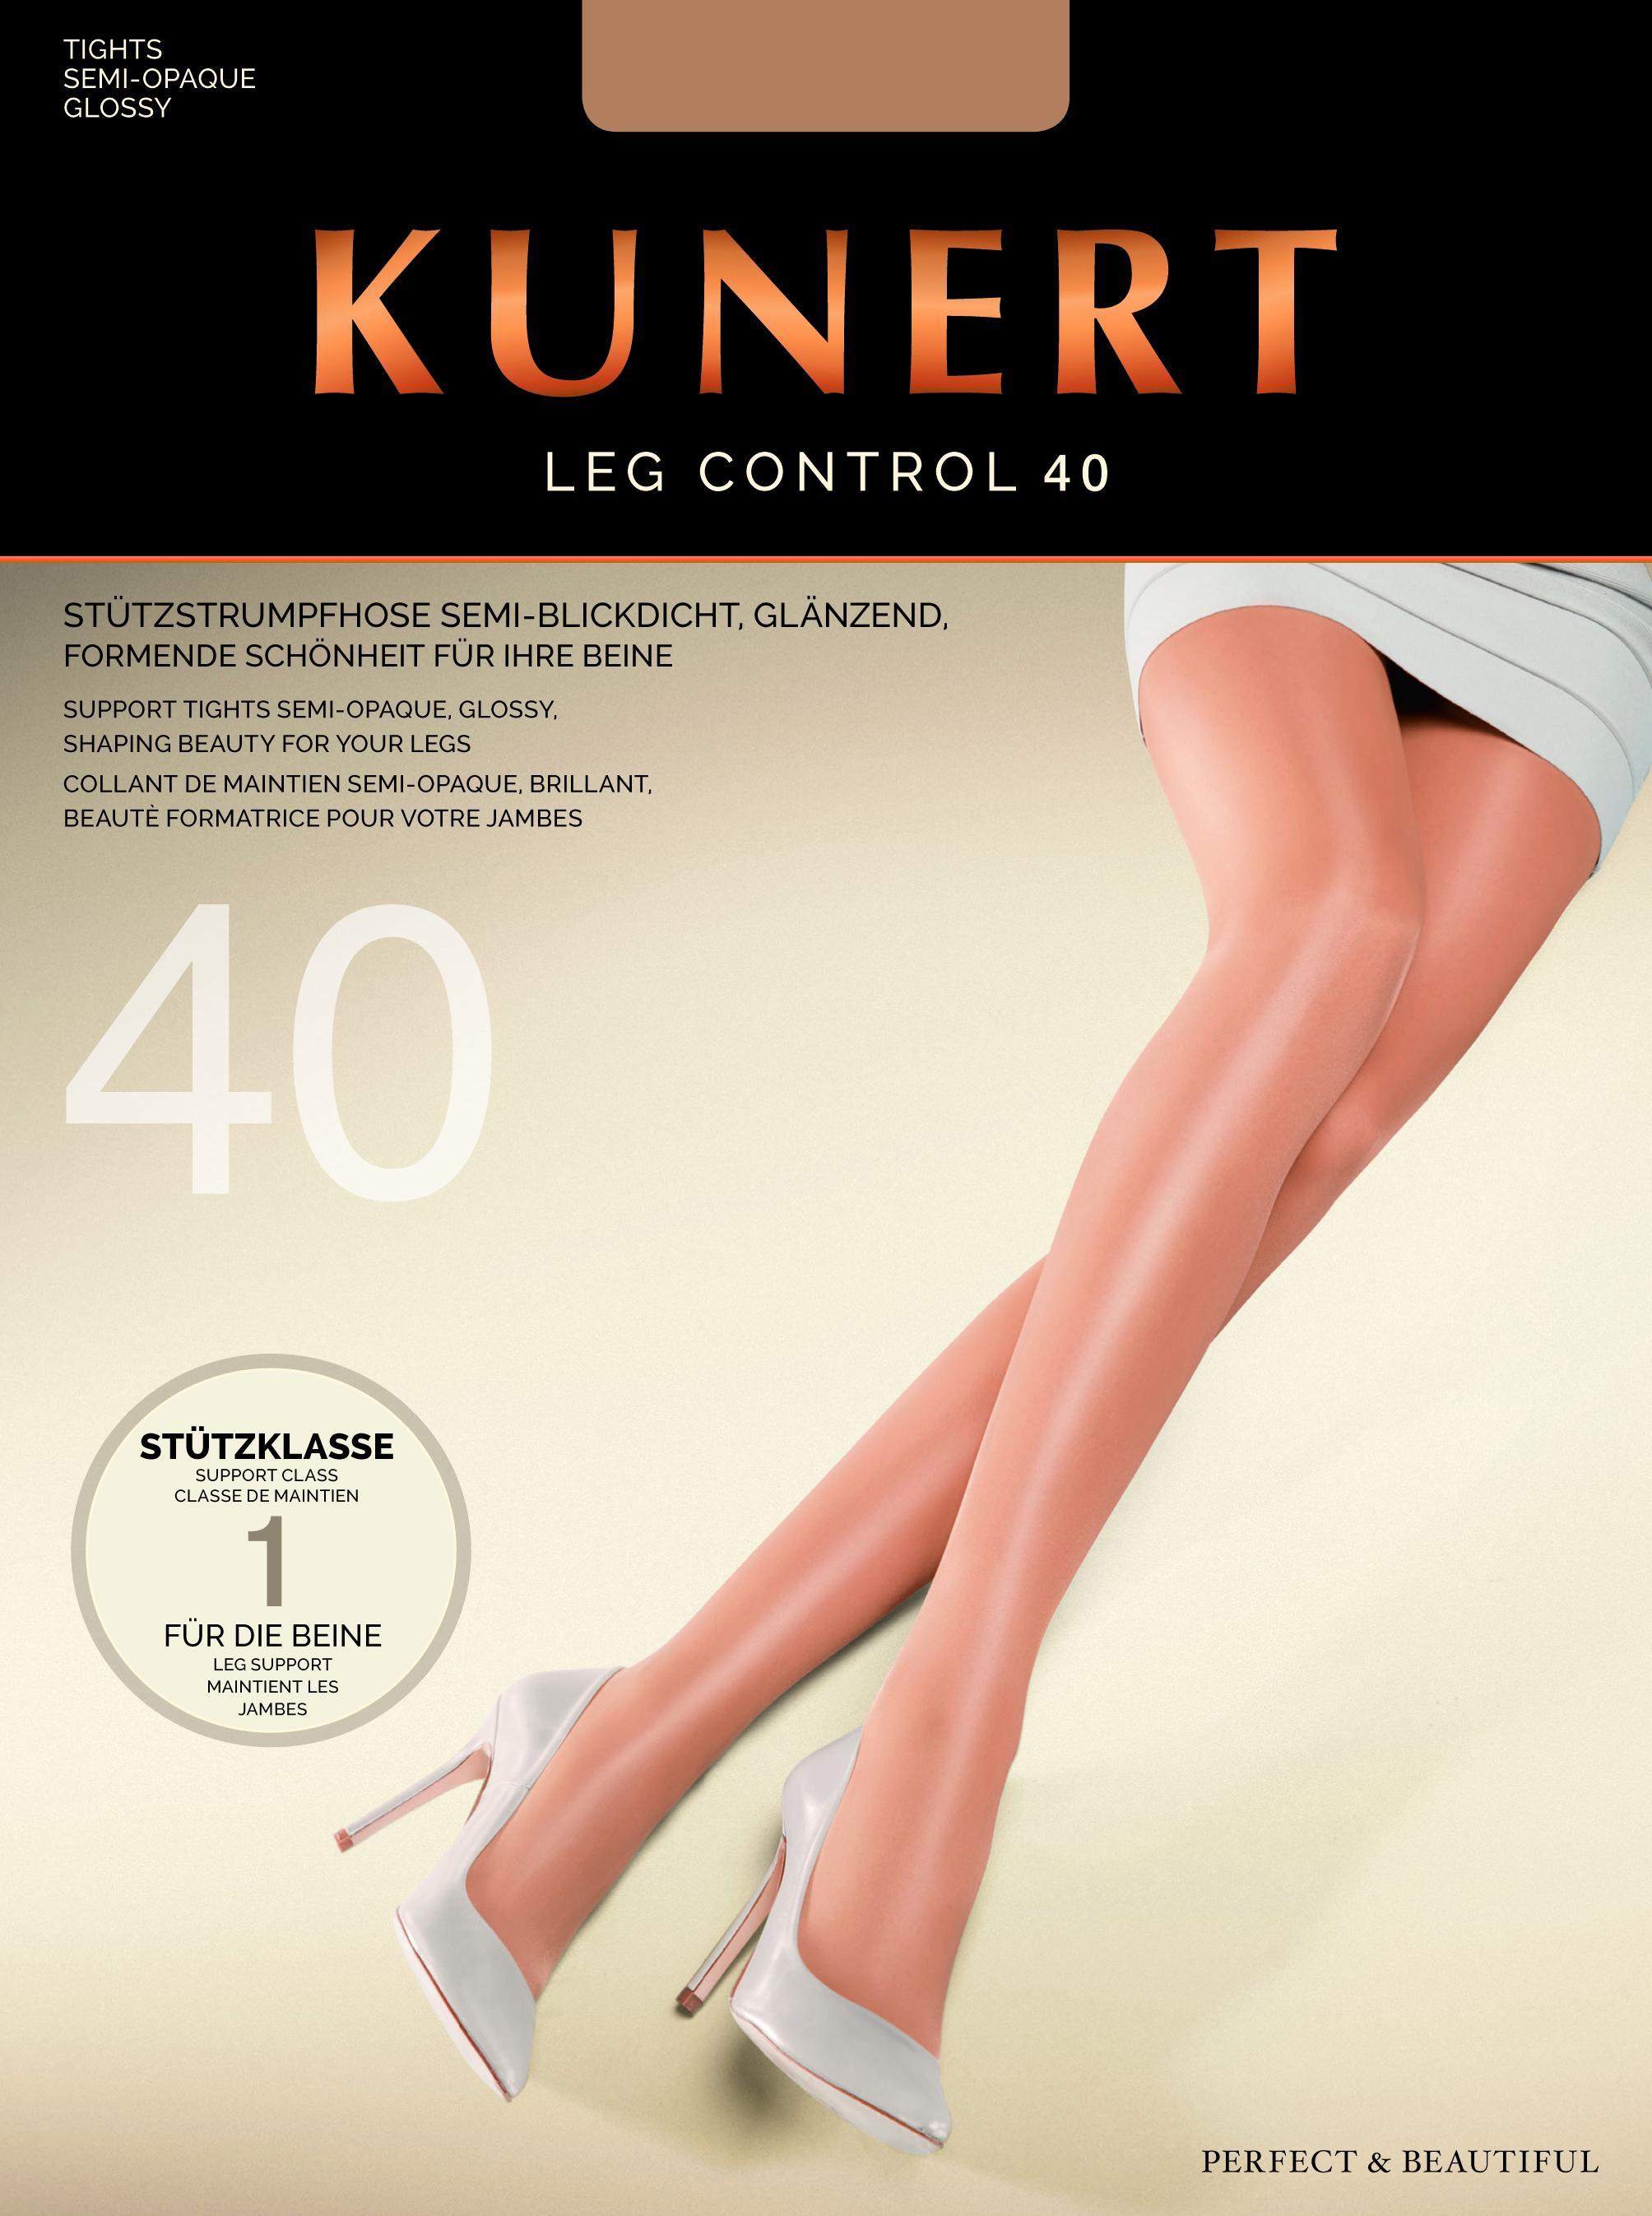 Kunert Leg Control 40 Semi Opaque Support Tights